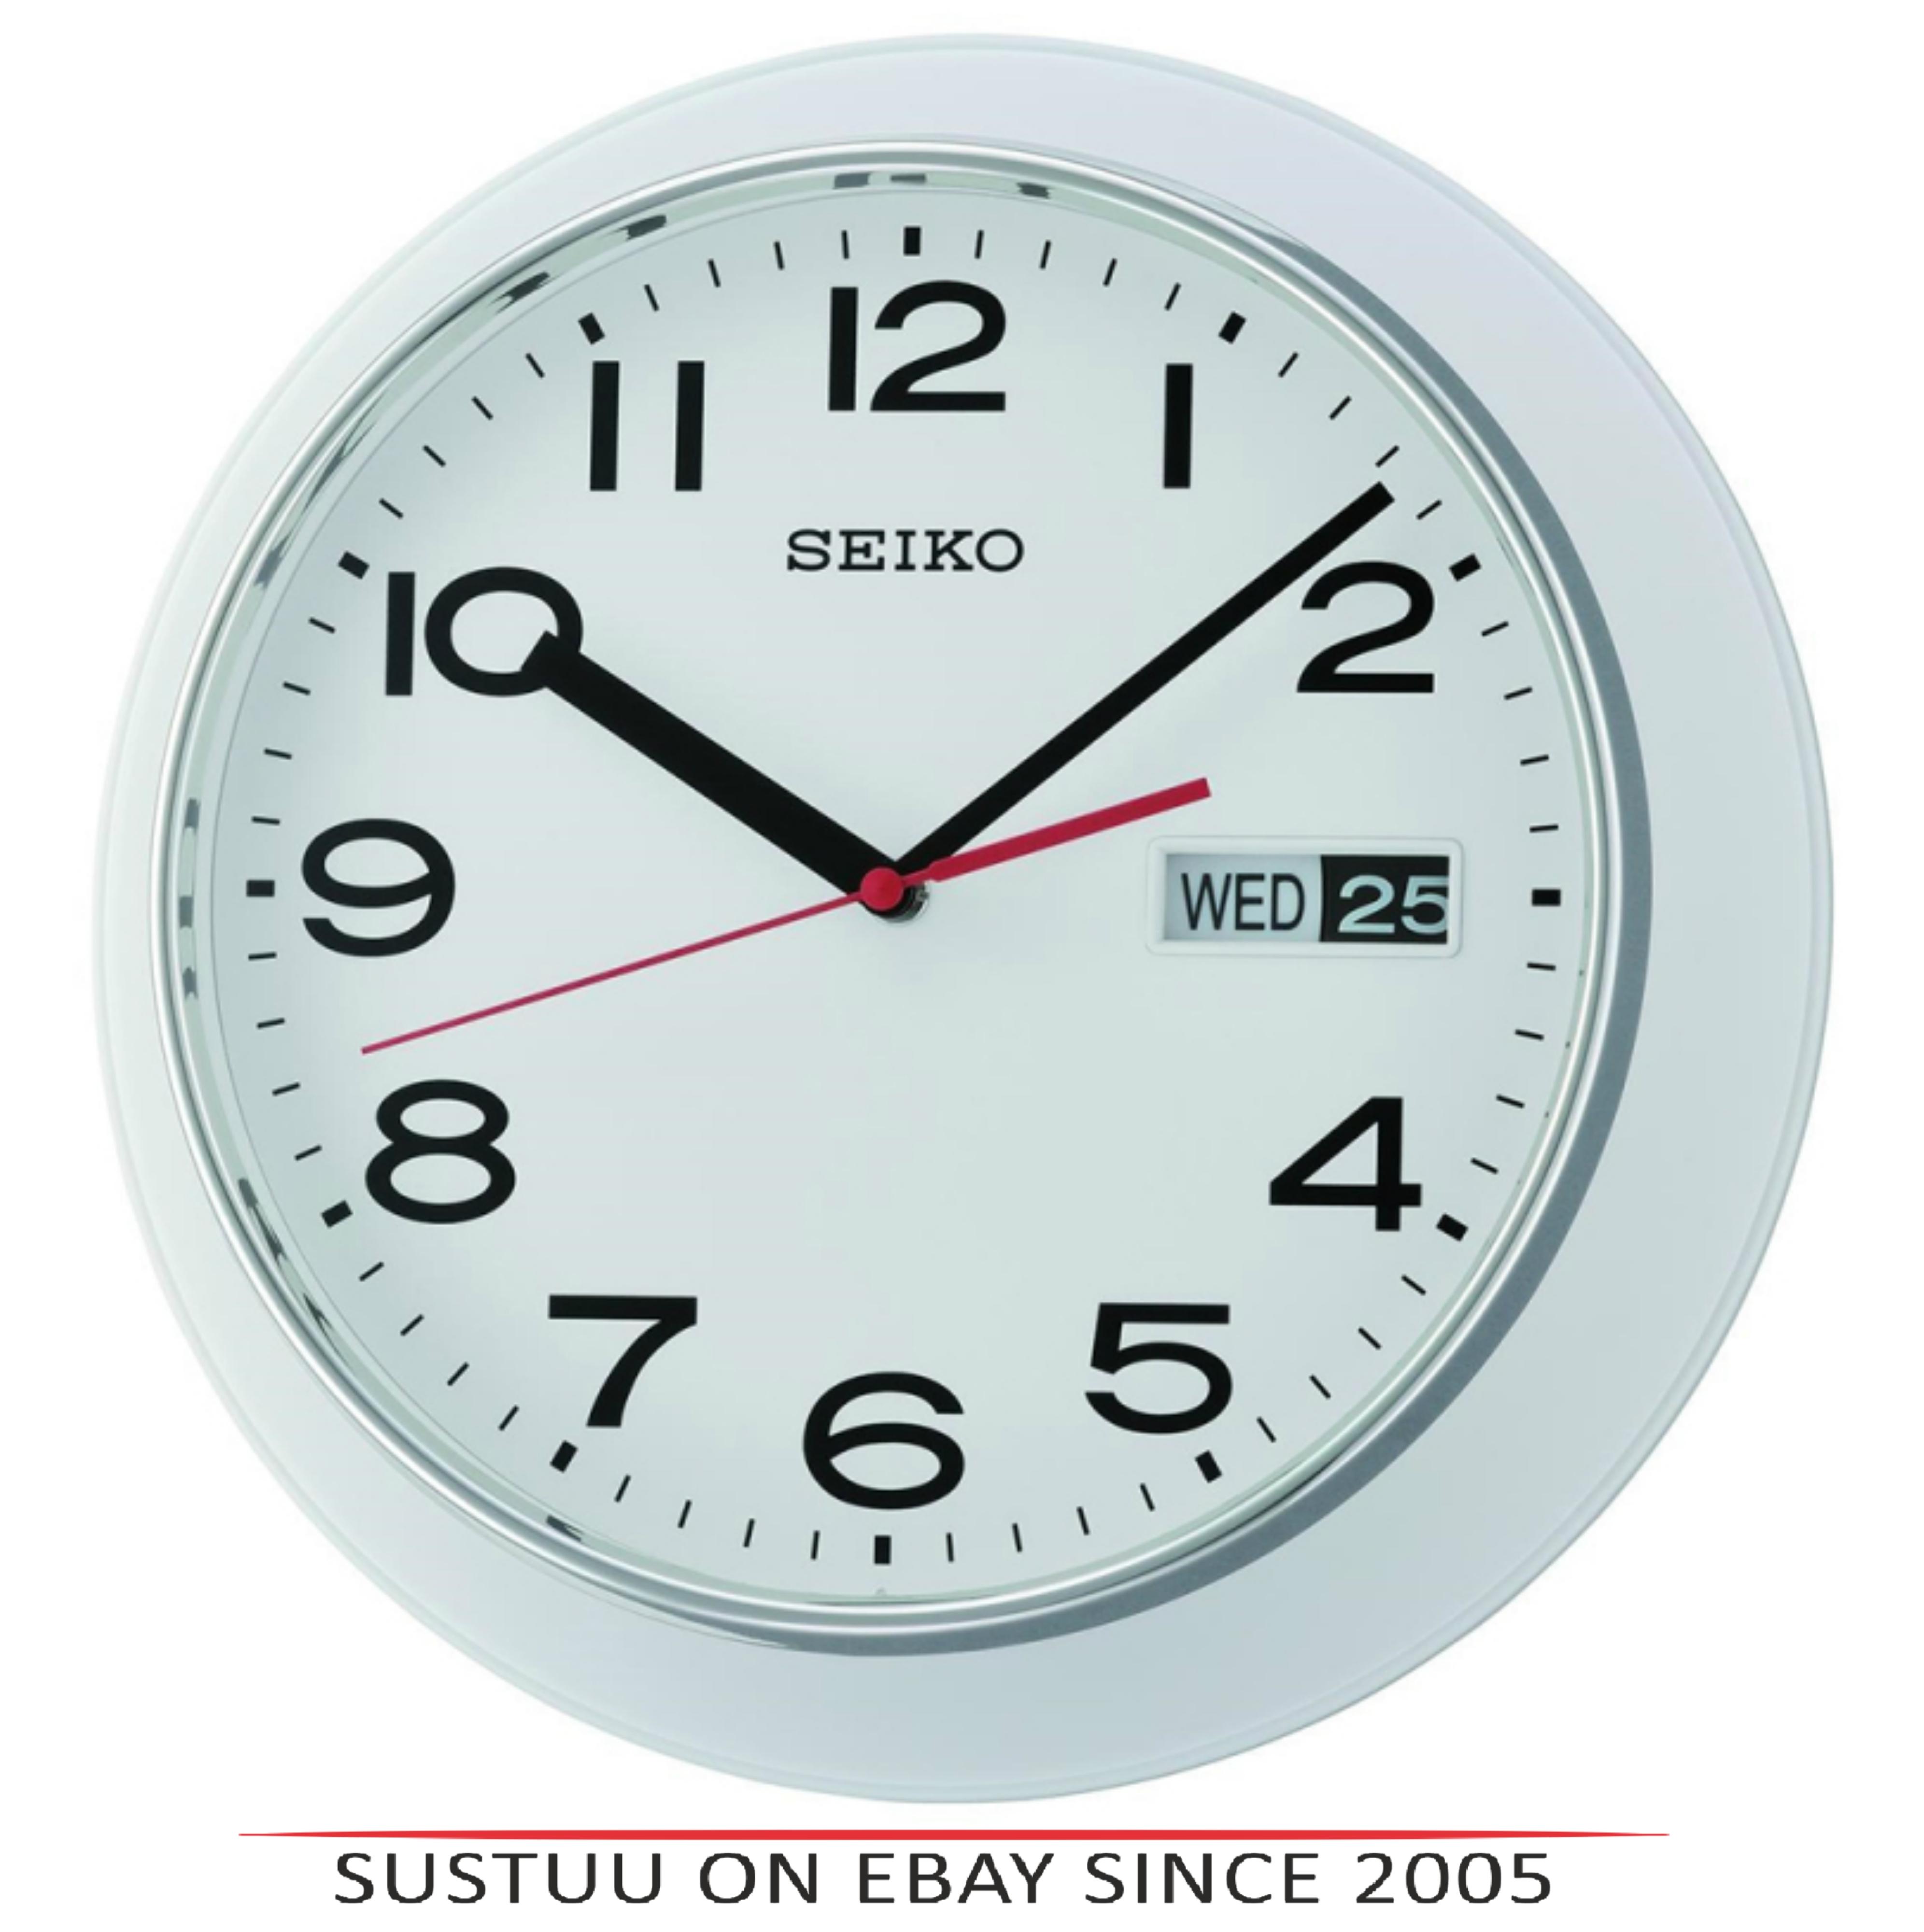 Seiko QXF102H Day & Date Calendar Display With Arabic Numerals Wall Clock-White